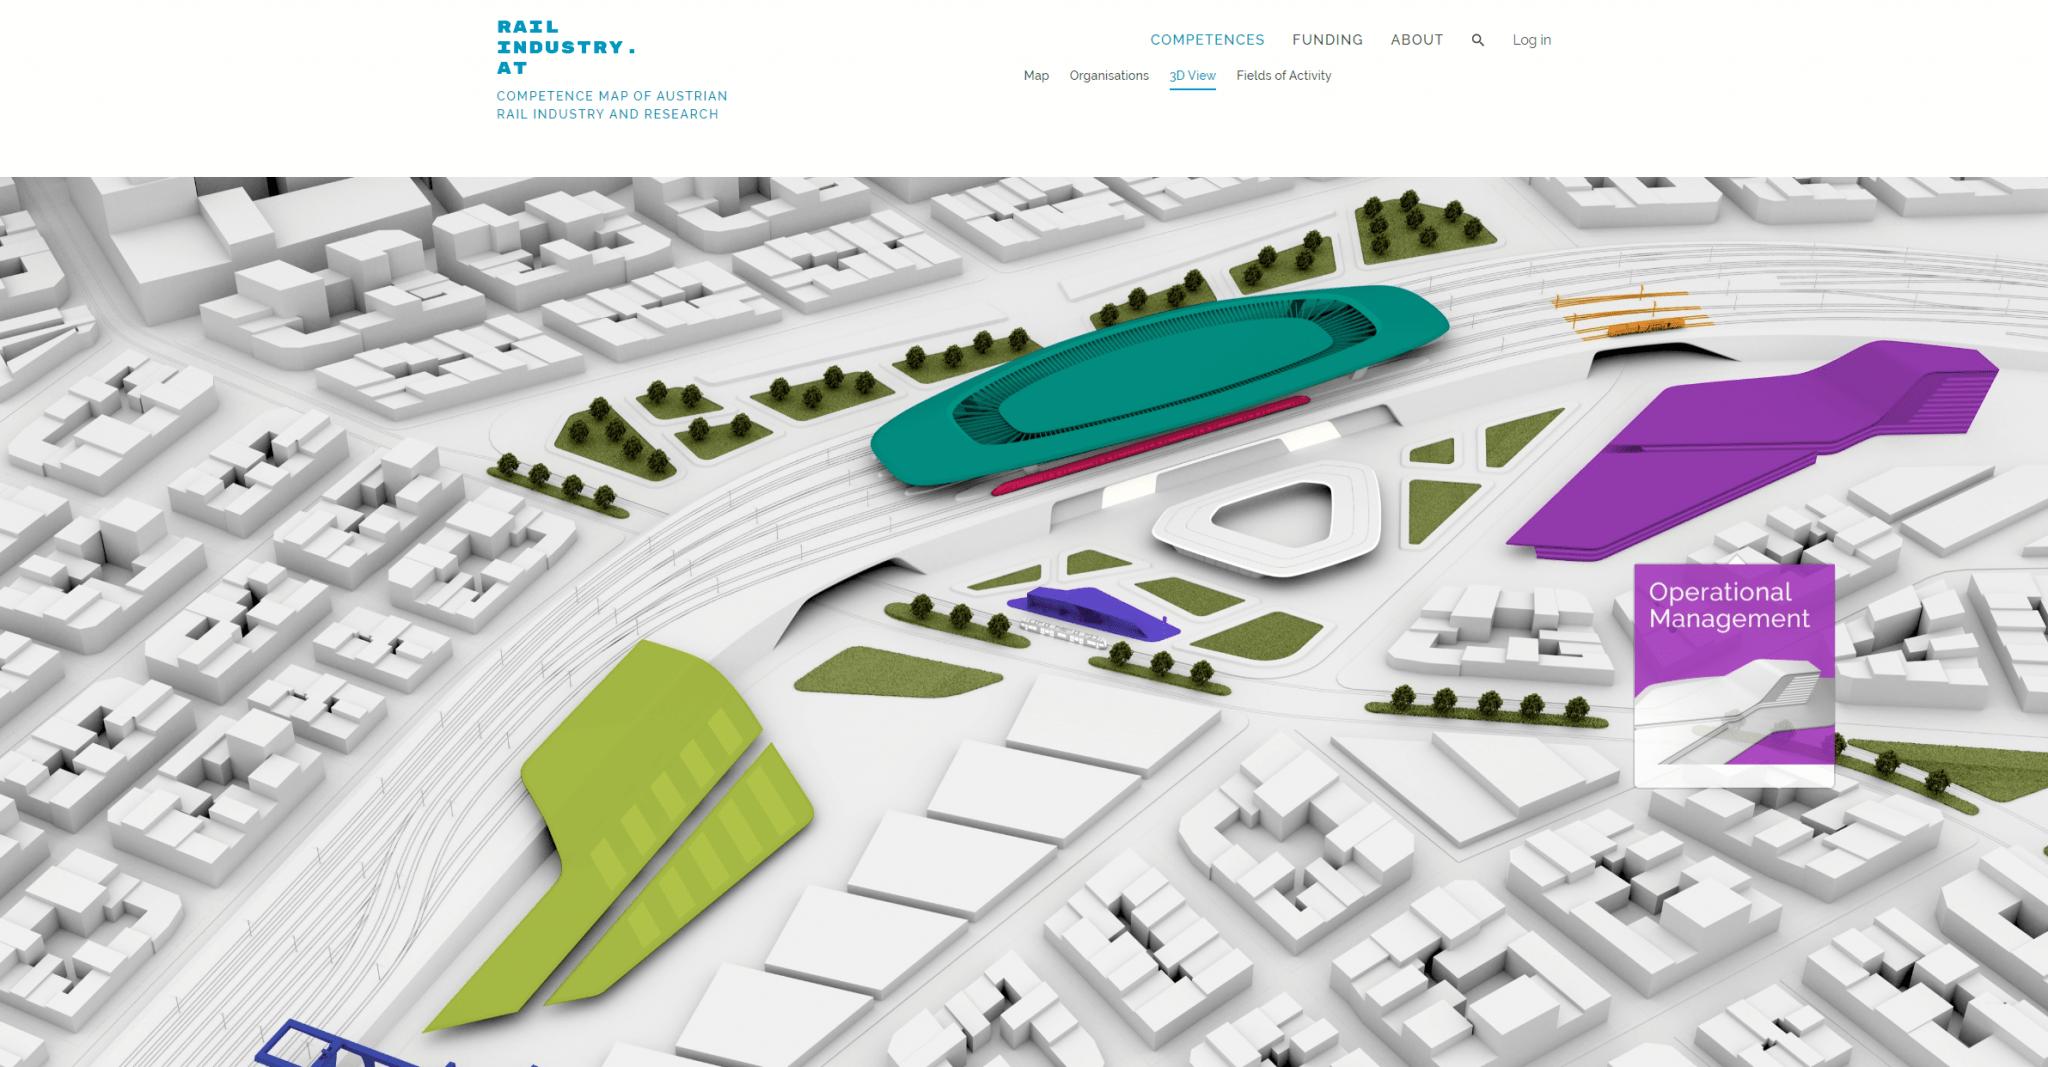 https___www.railindustry.at_3d-view 3D View – railindustry.at_002